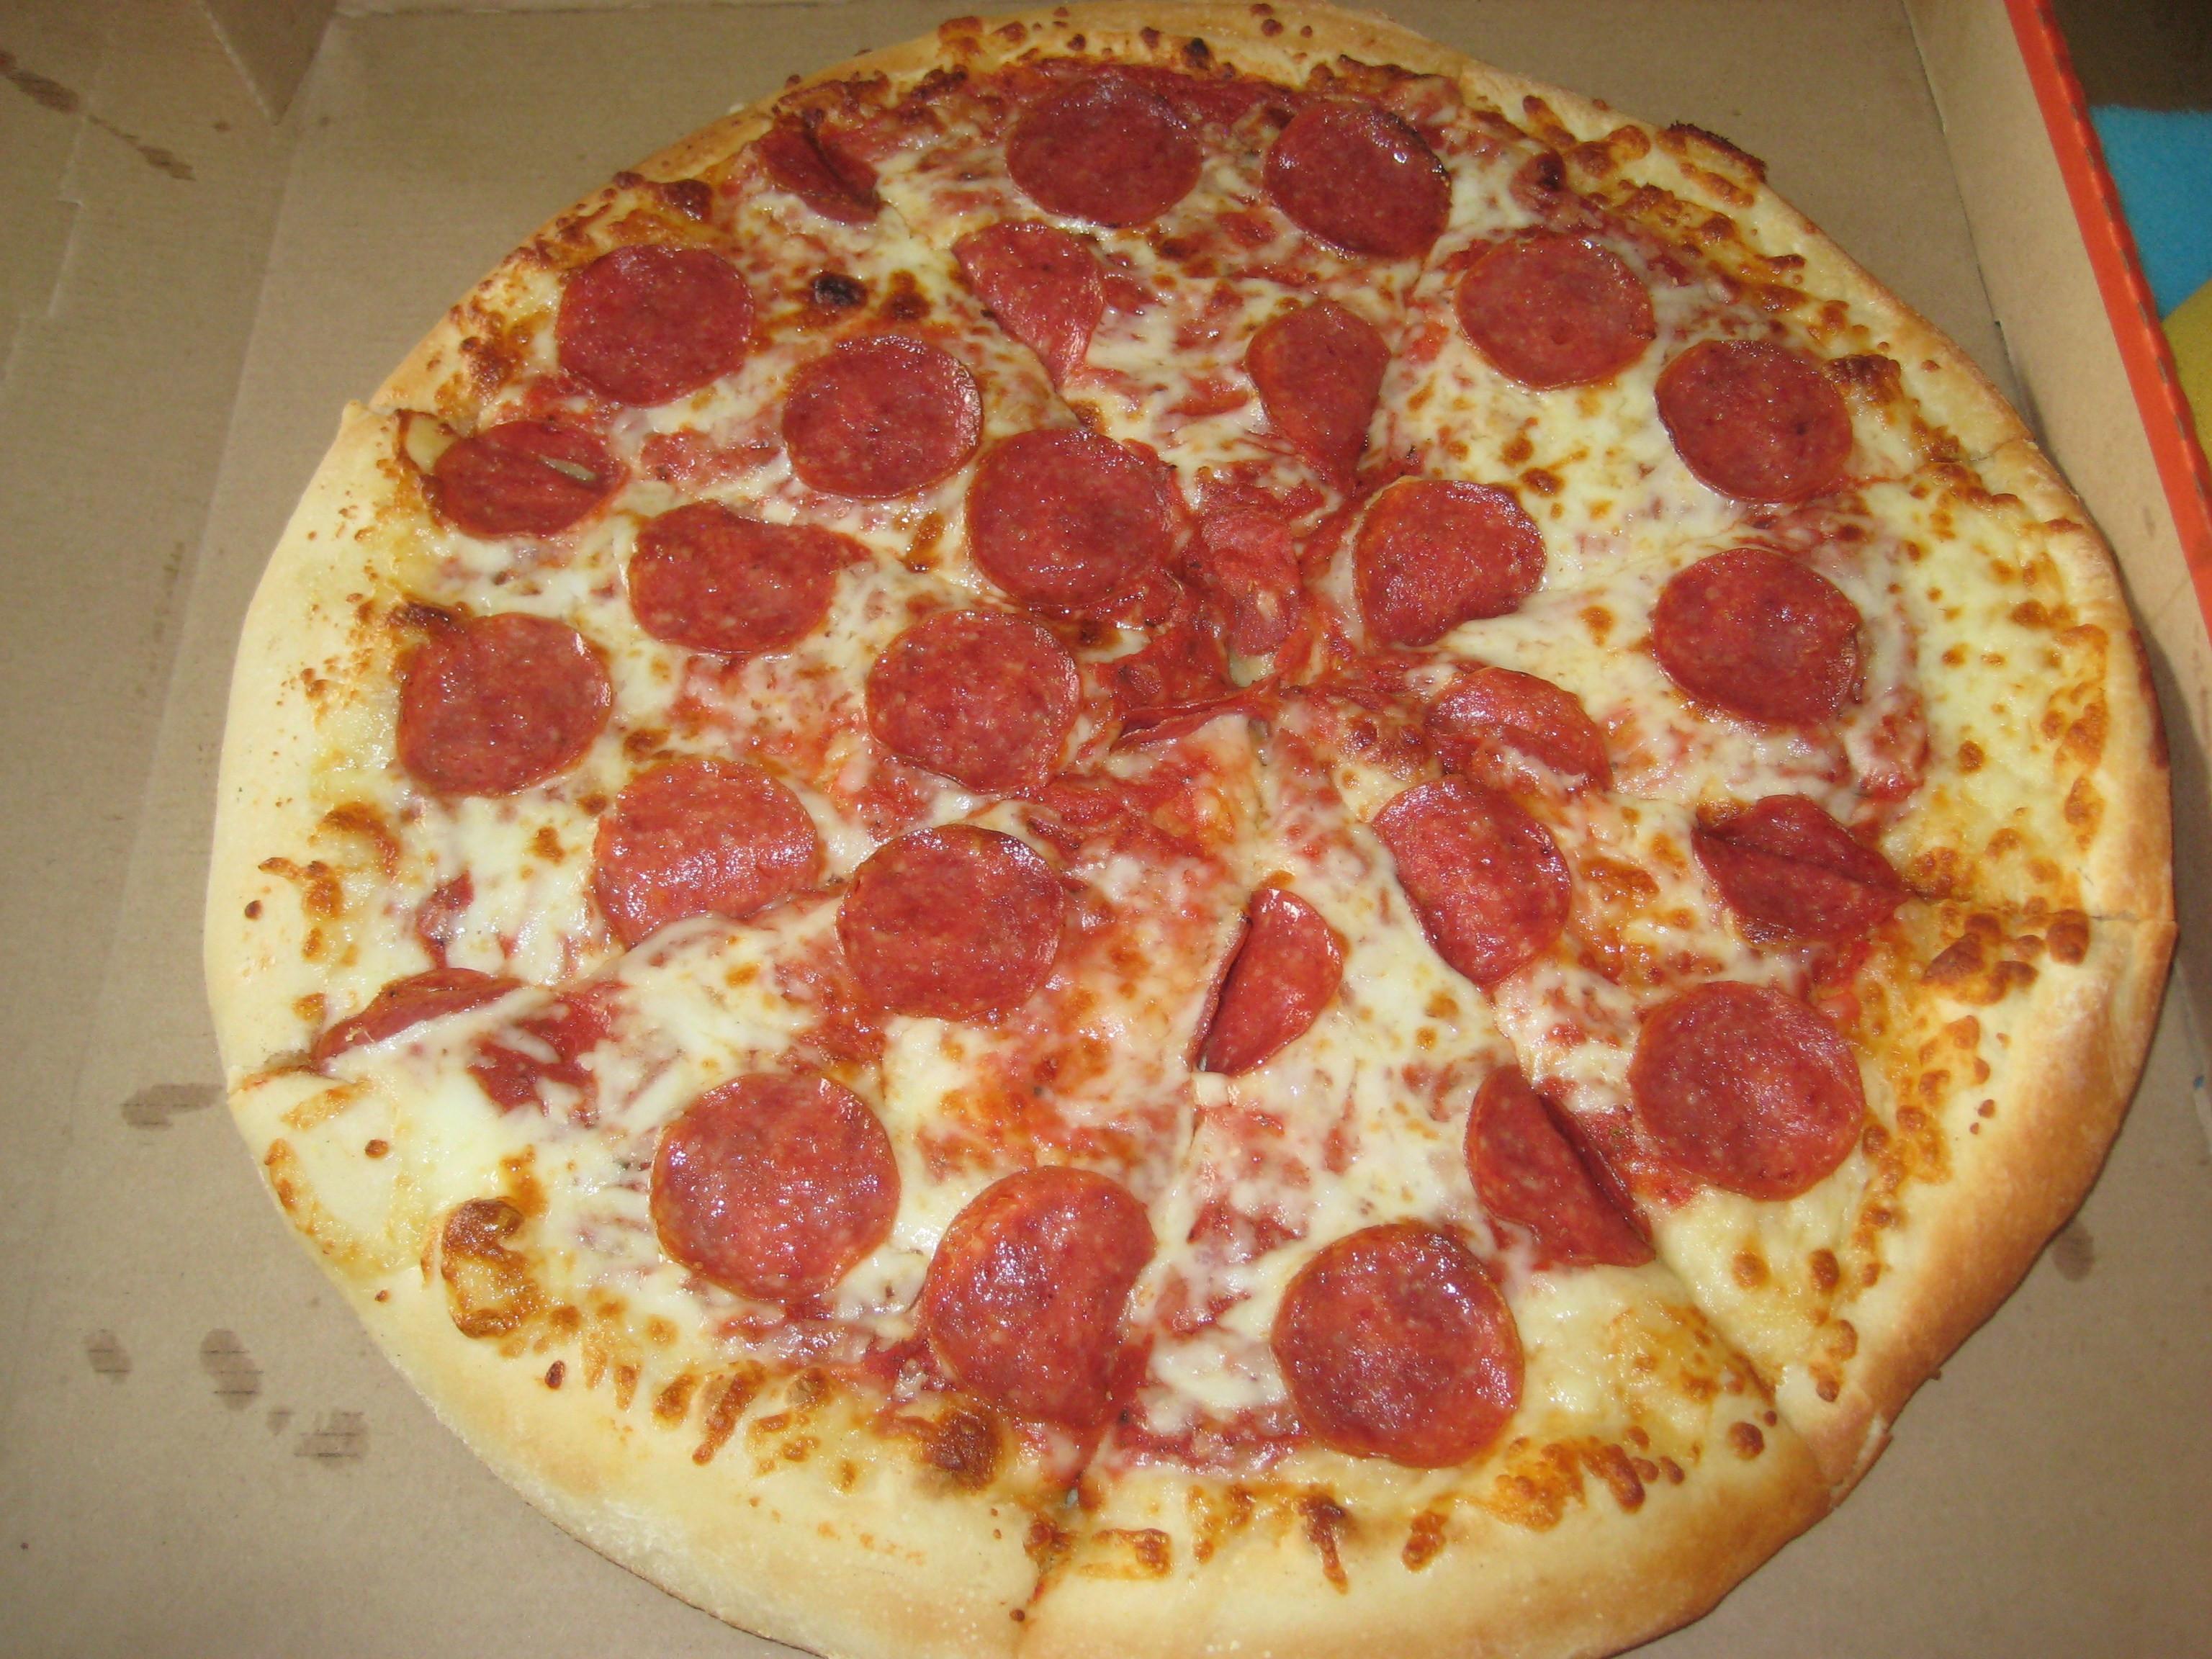 Little Caesars Hot-N-Ready Extramostbestest Pizza, Pepperoni  Getting Hot N Ready at Little Caesars – The Unvegan